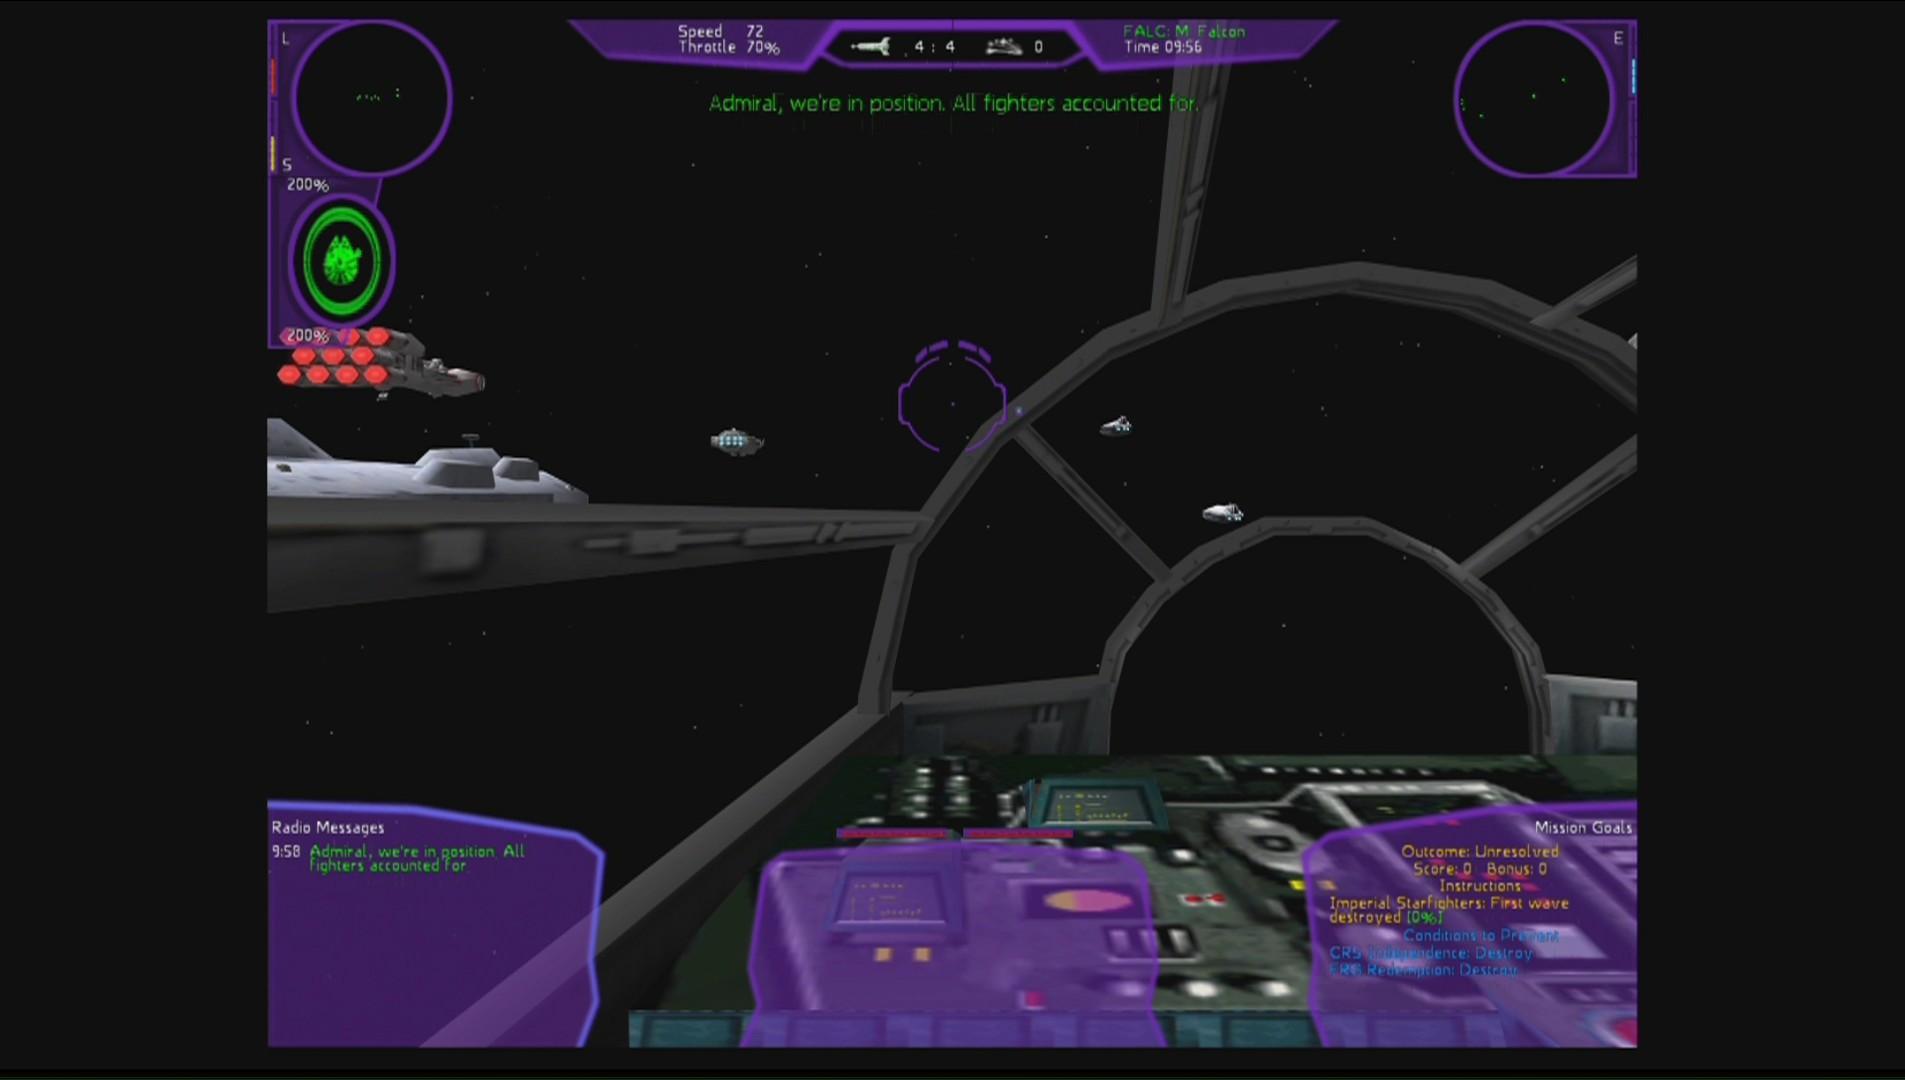 STAR WARS - X-Wing Alliance screenshot 1